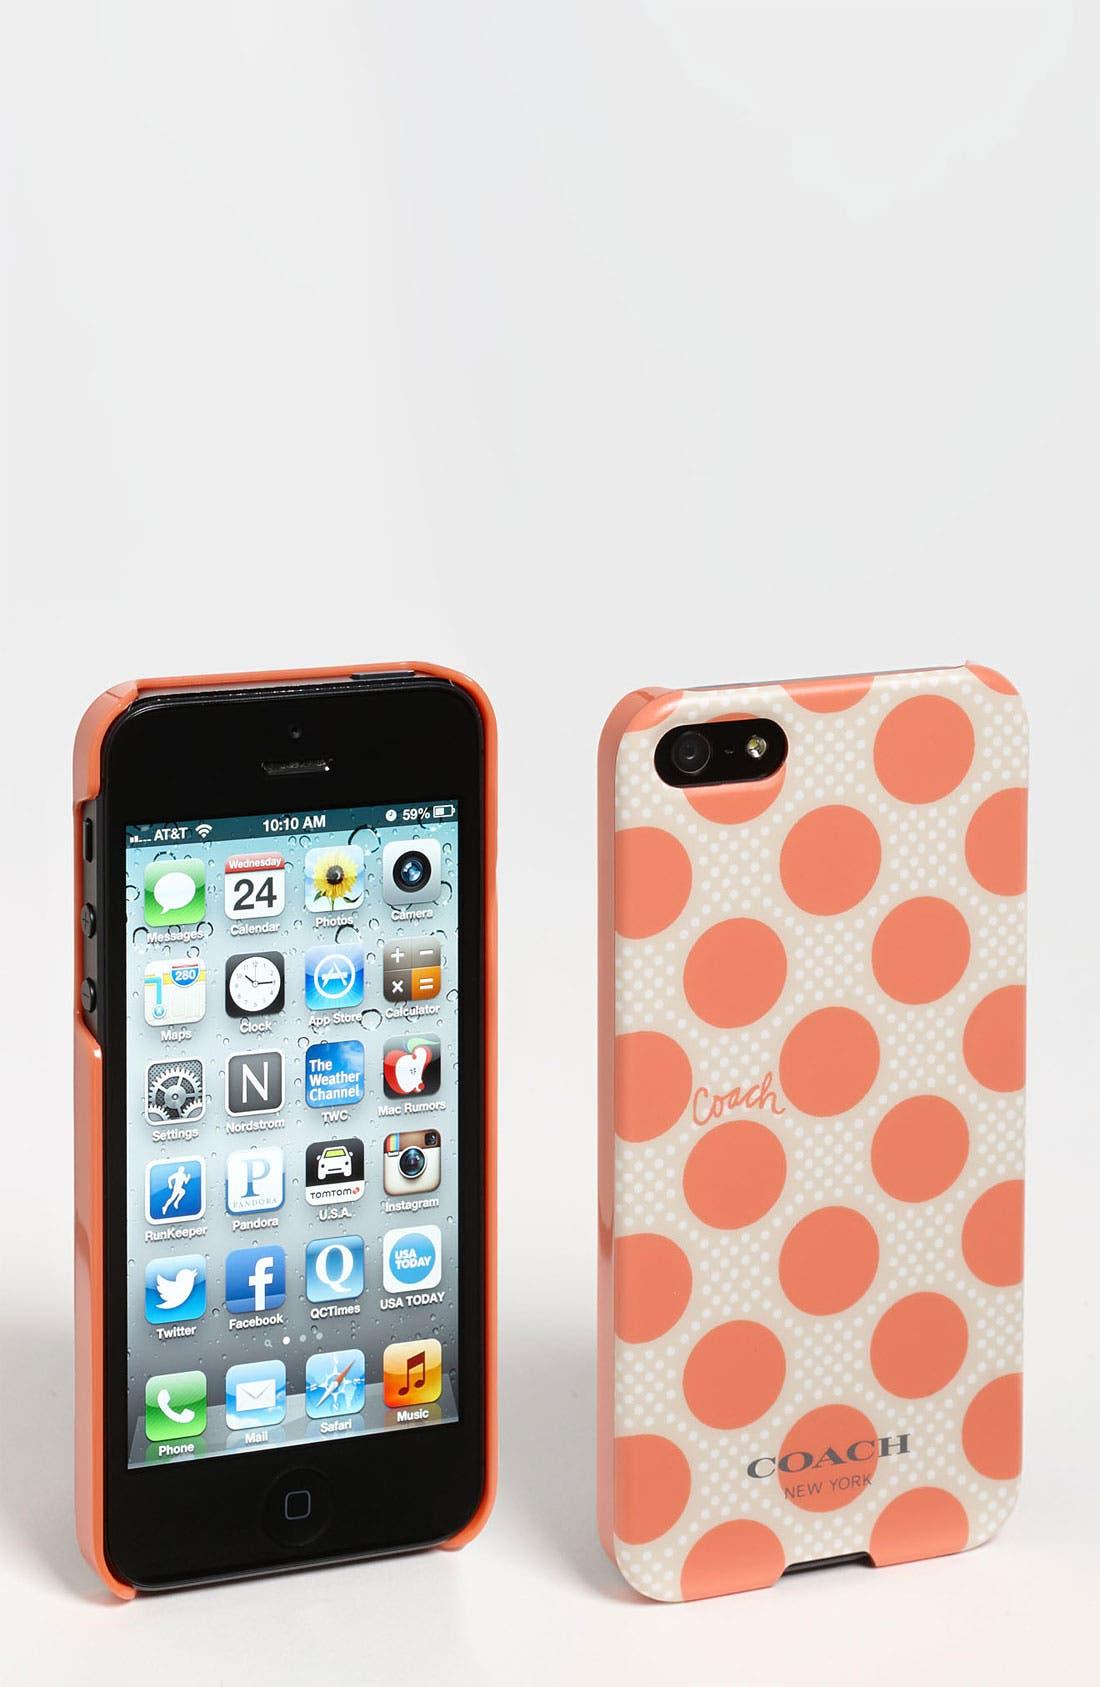 Alternate Image 1 Selected - COACH 'Polka Dot' iPhone 5 Case